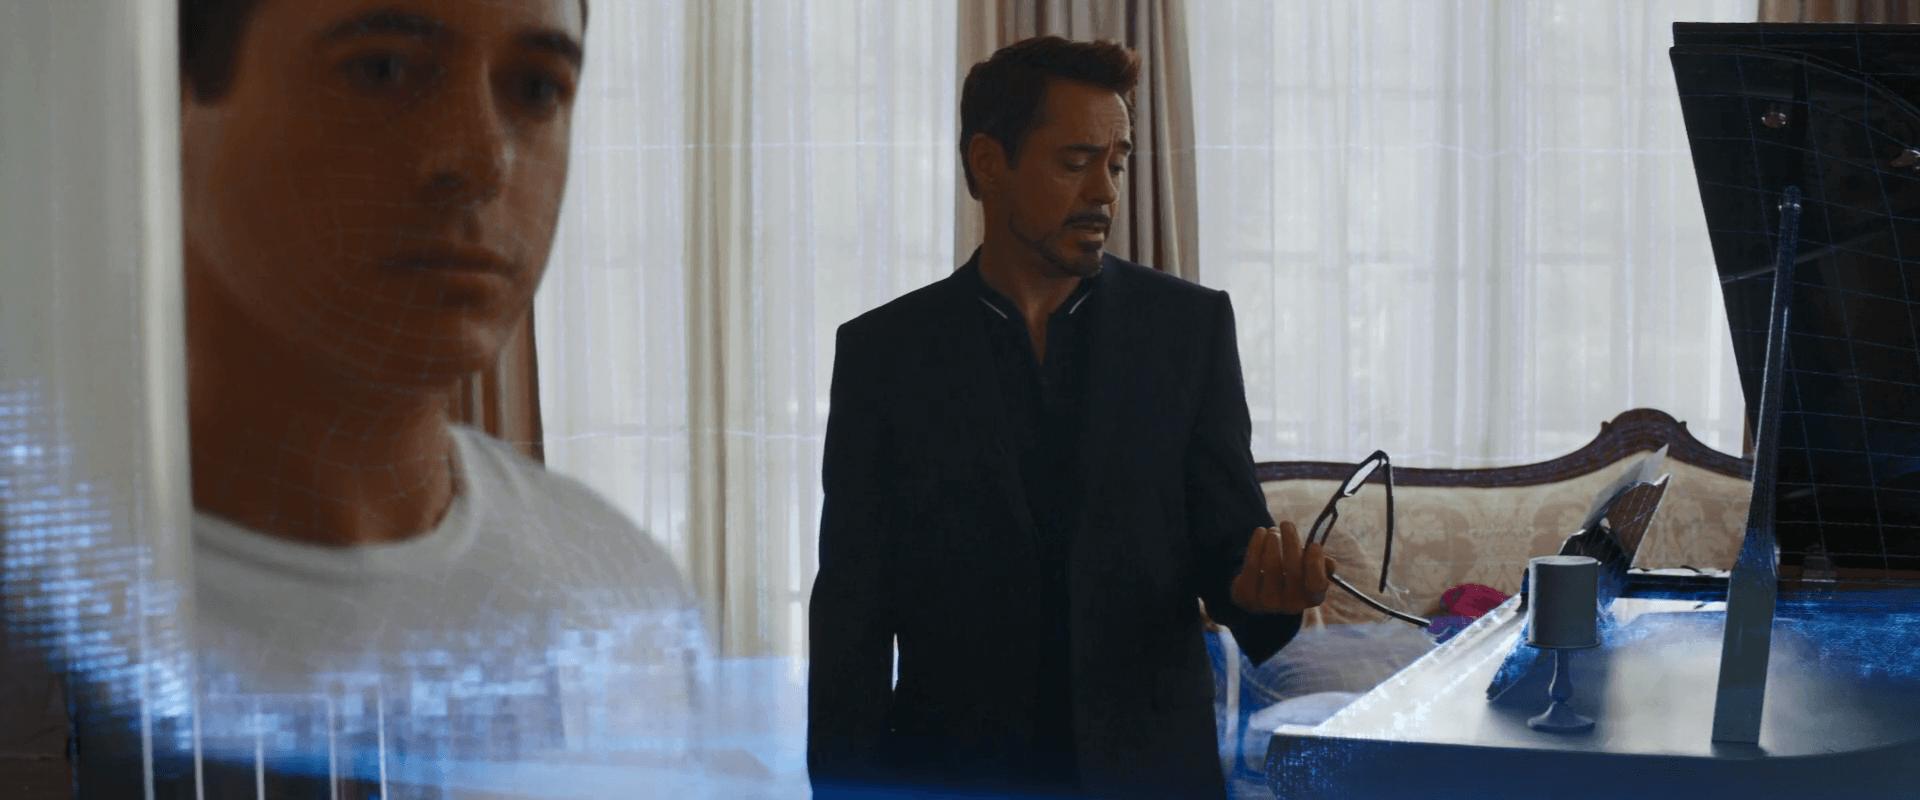 Robert Downey Jr. as Tony Stark in Captain America: Civil War